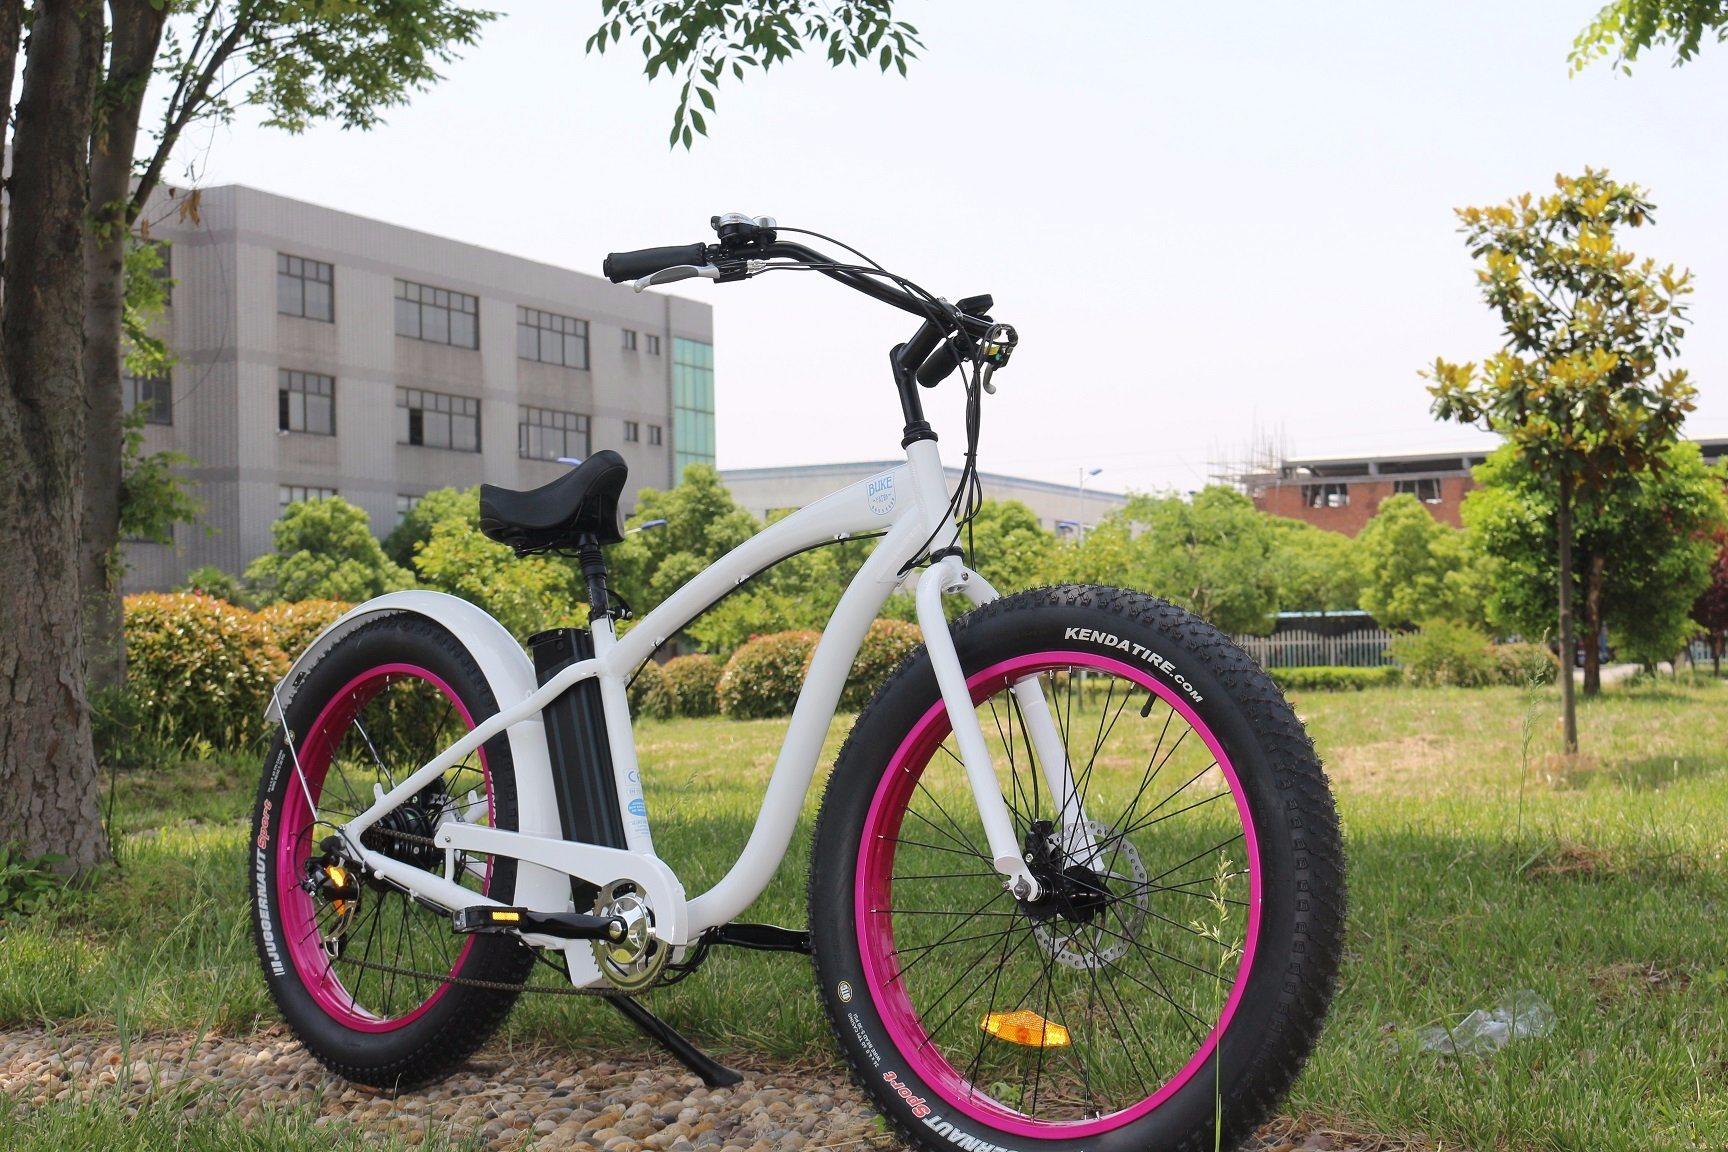 City Cruiser 48V13ah All Terrain 4.0 Inch Wide Fat Tire 500W Beach Cruiser Electric Bike